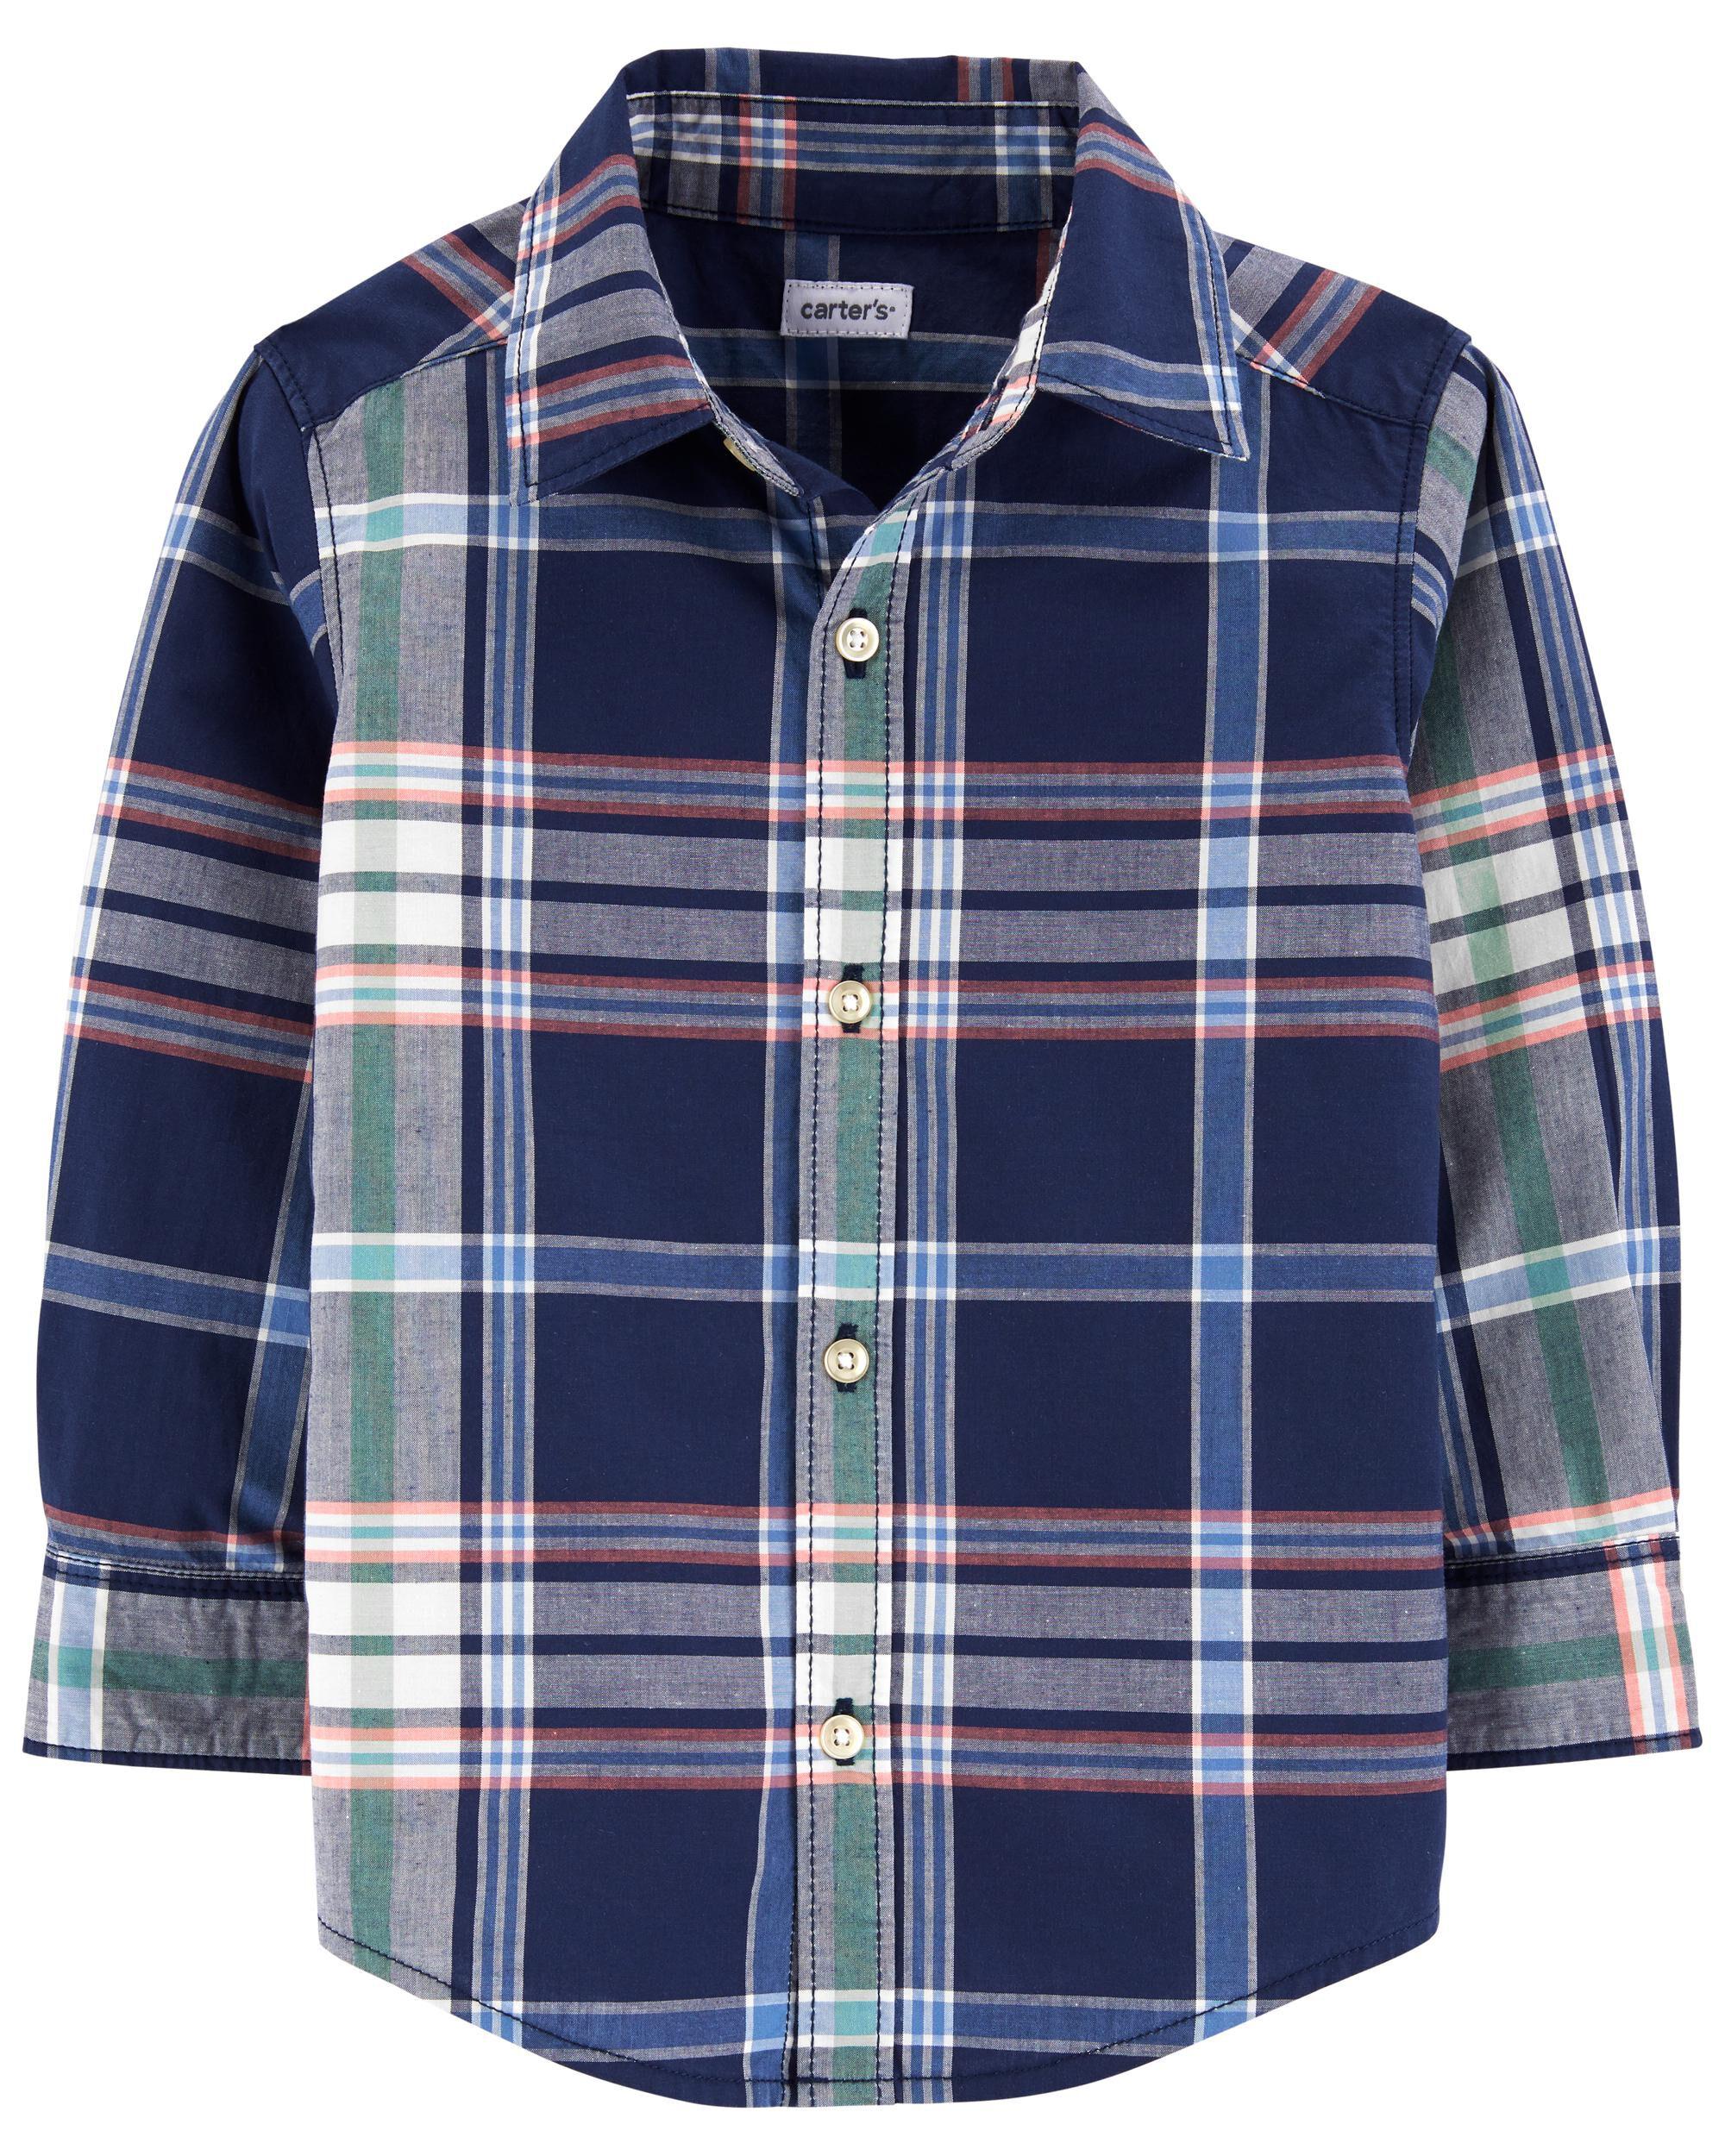 *DOORBUSTER* Plaid Button-Front Shirt